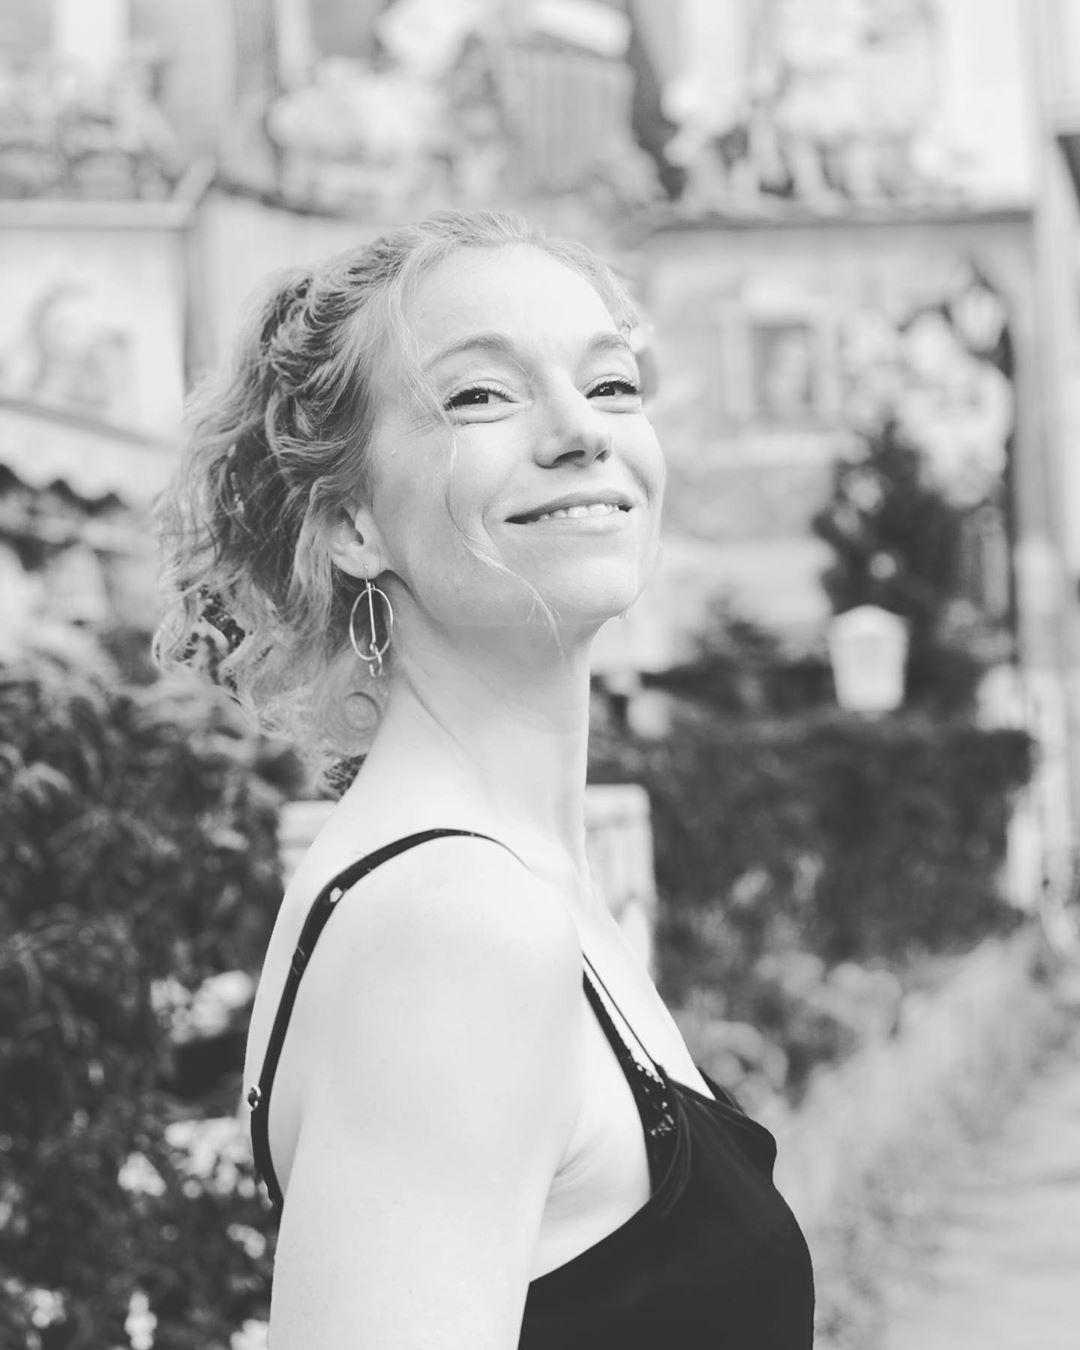 Marleen Lohse on Instagram: Tag zwei unserer Tour! Danke